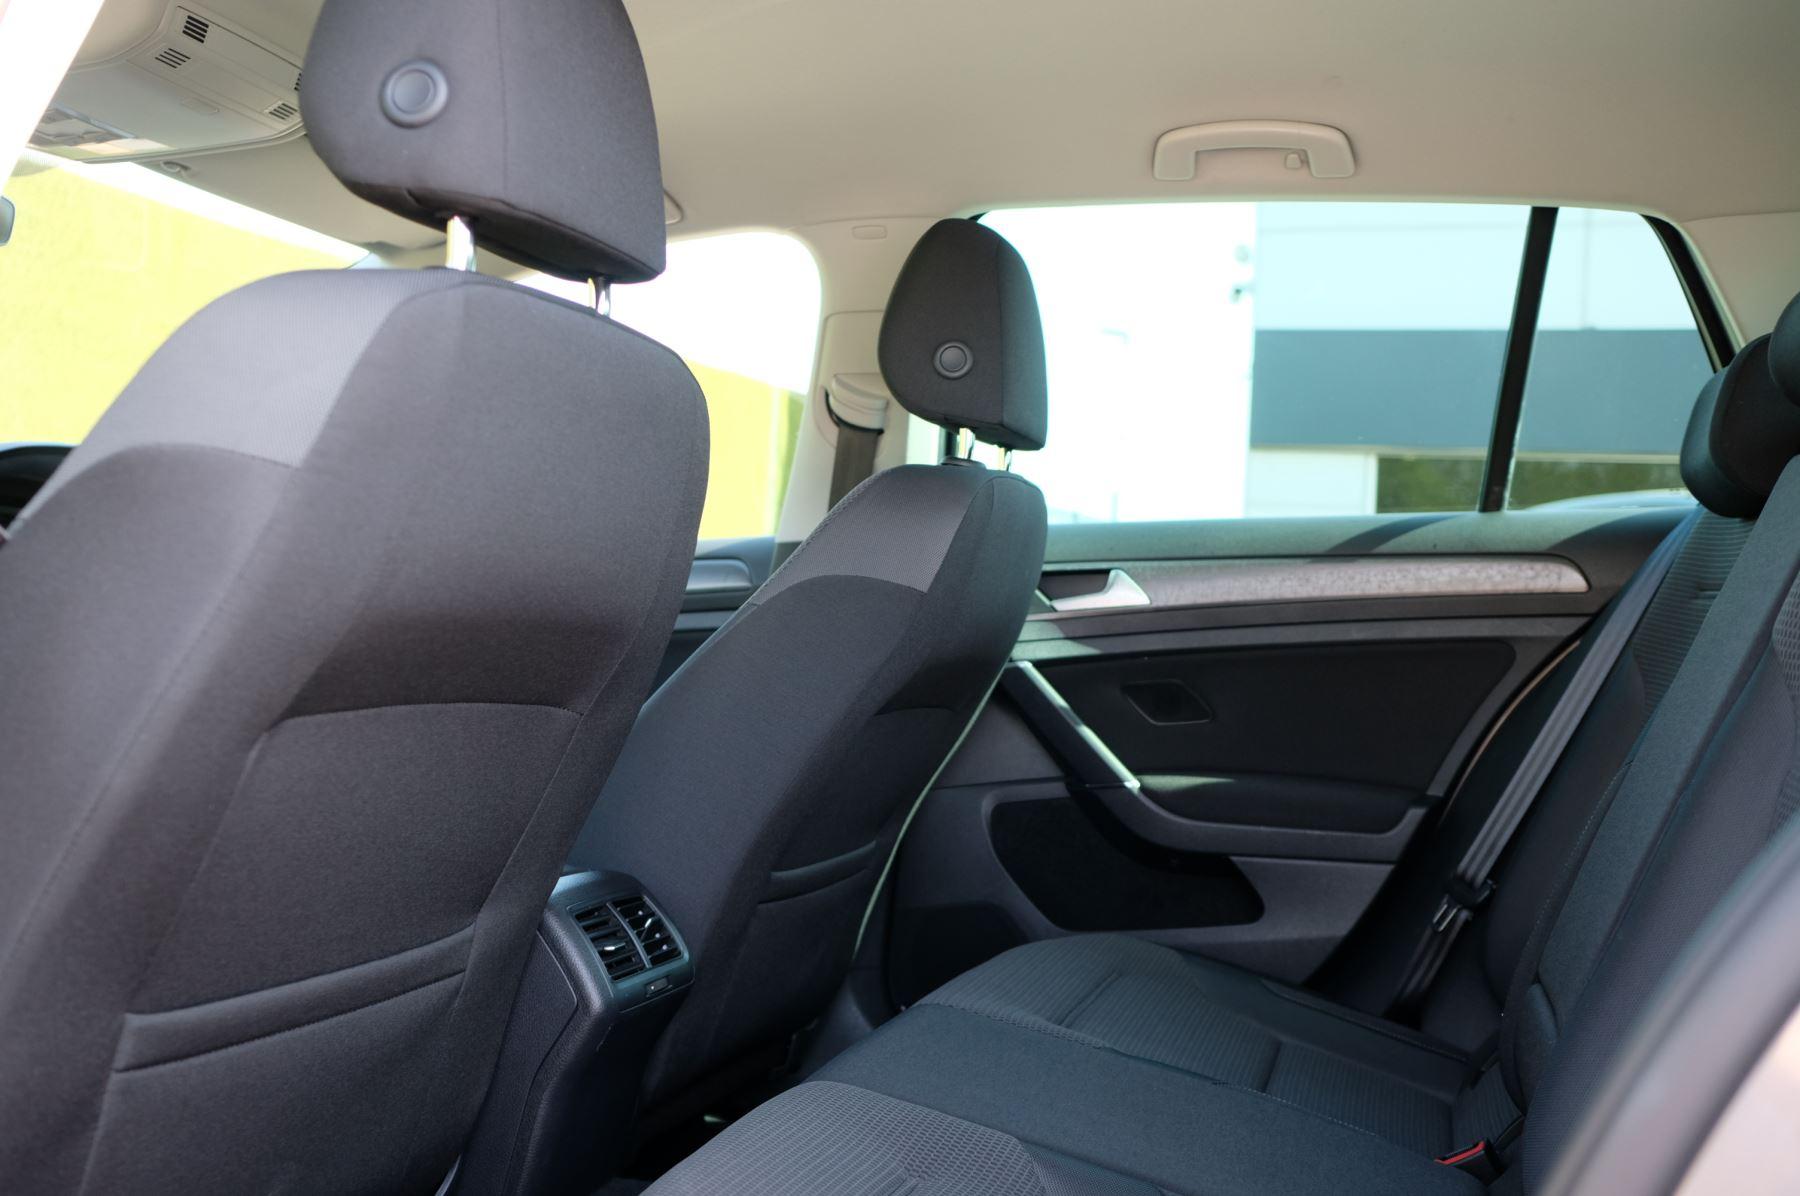 Volkswagen Golf 1.5 TSI EVO 150hp Match 5 Door DSG Auto with A/Con, Sat Nav, Alloys & Adaptive Cruise  image 13